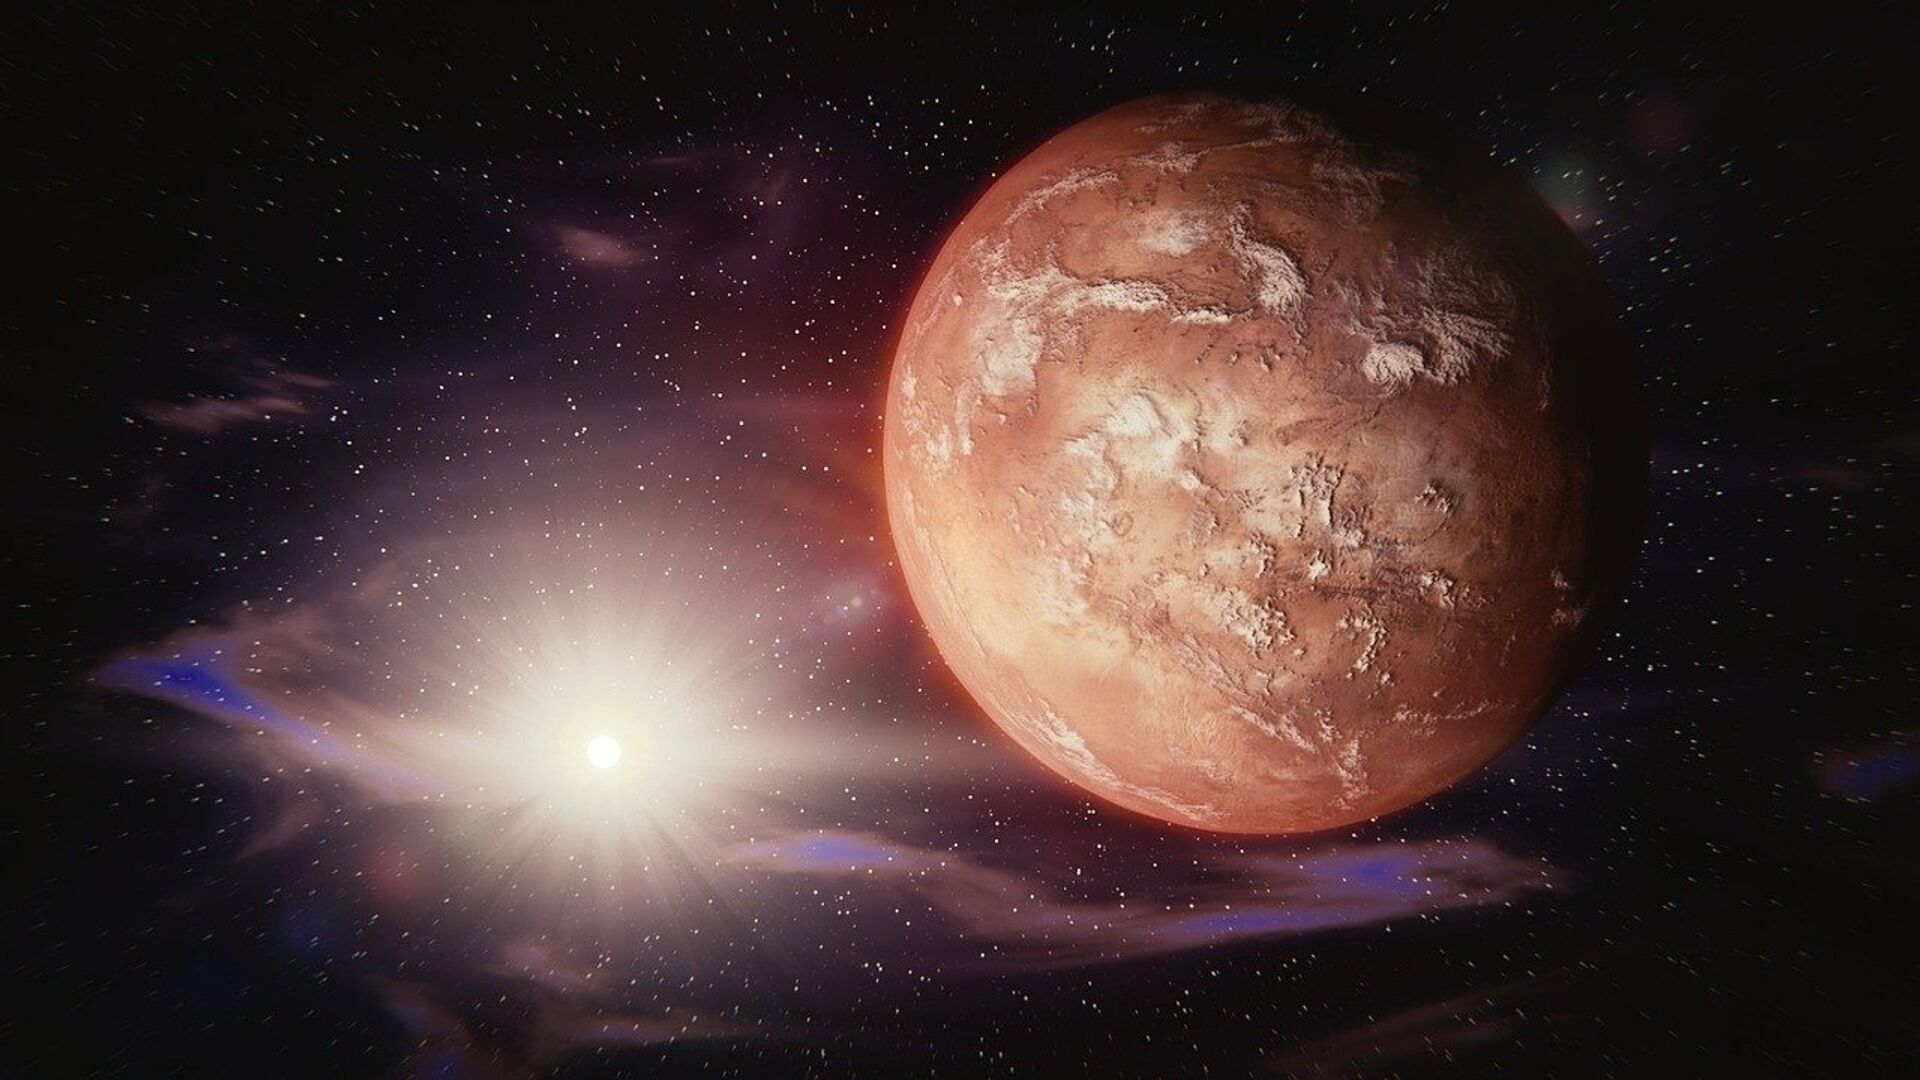 El Marte (imagen ilustrativa) - Sputnik Mundo, 1920, 01.03.2021